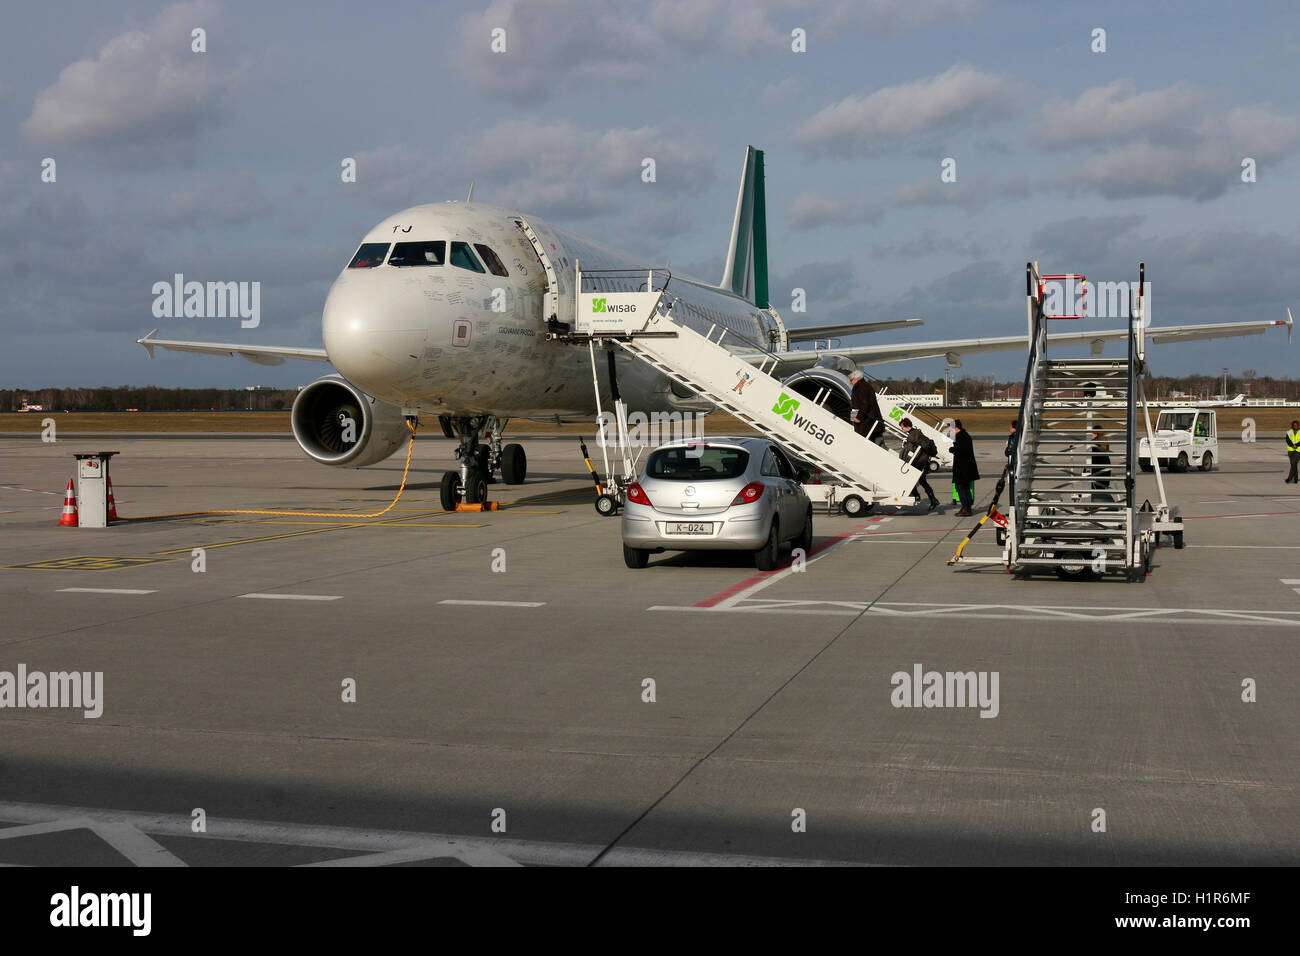 Flugzeug, Flughafen Tegel, Berlin. - Stock Image